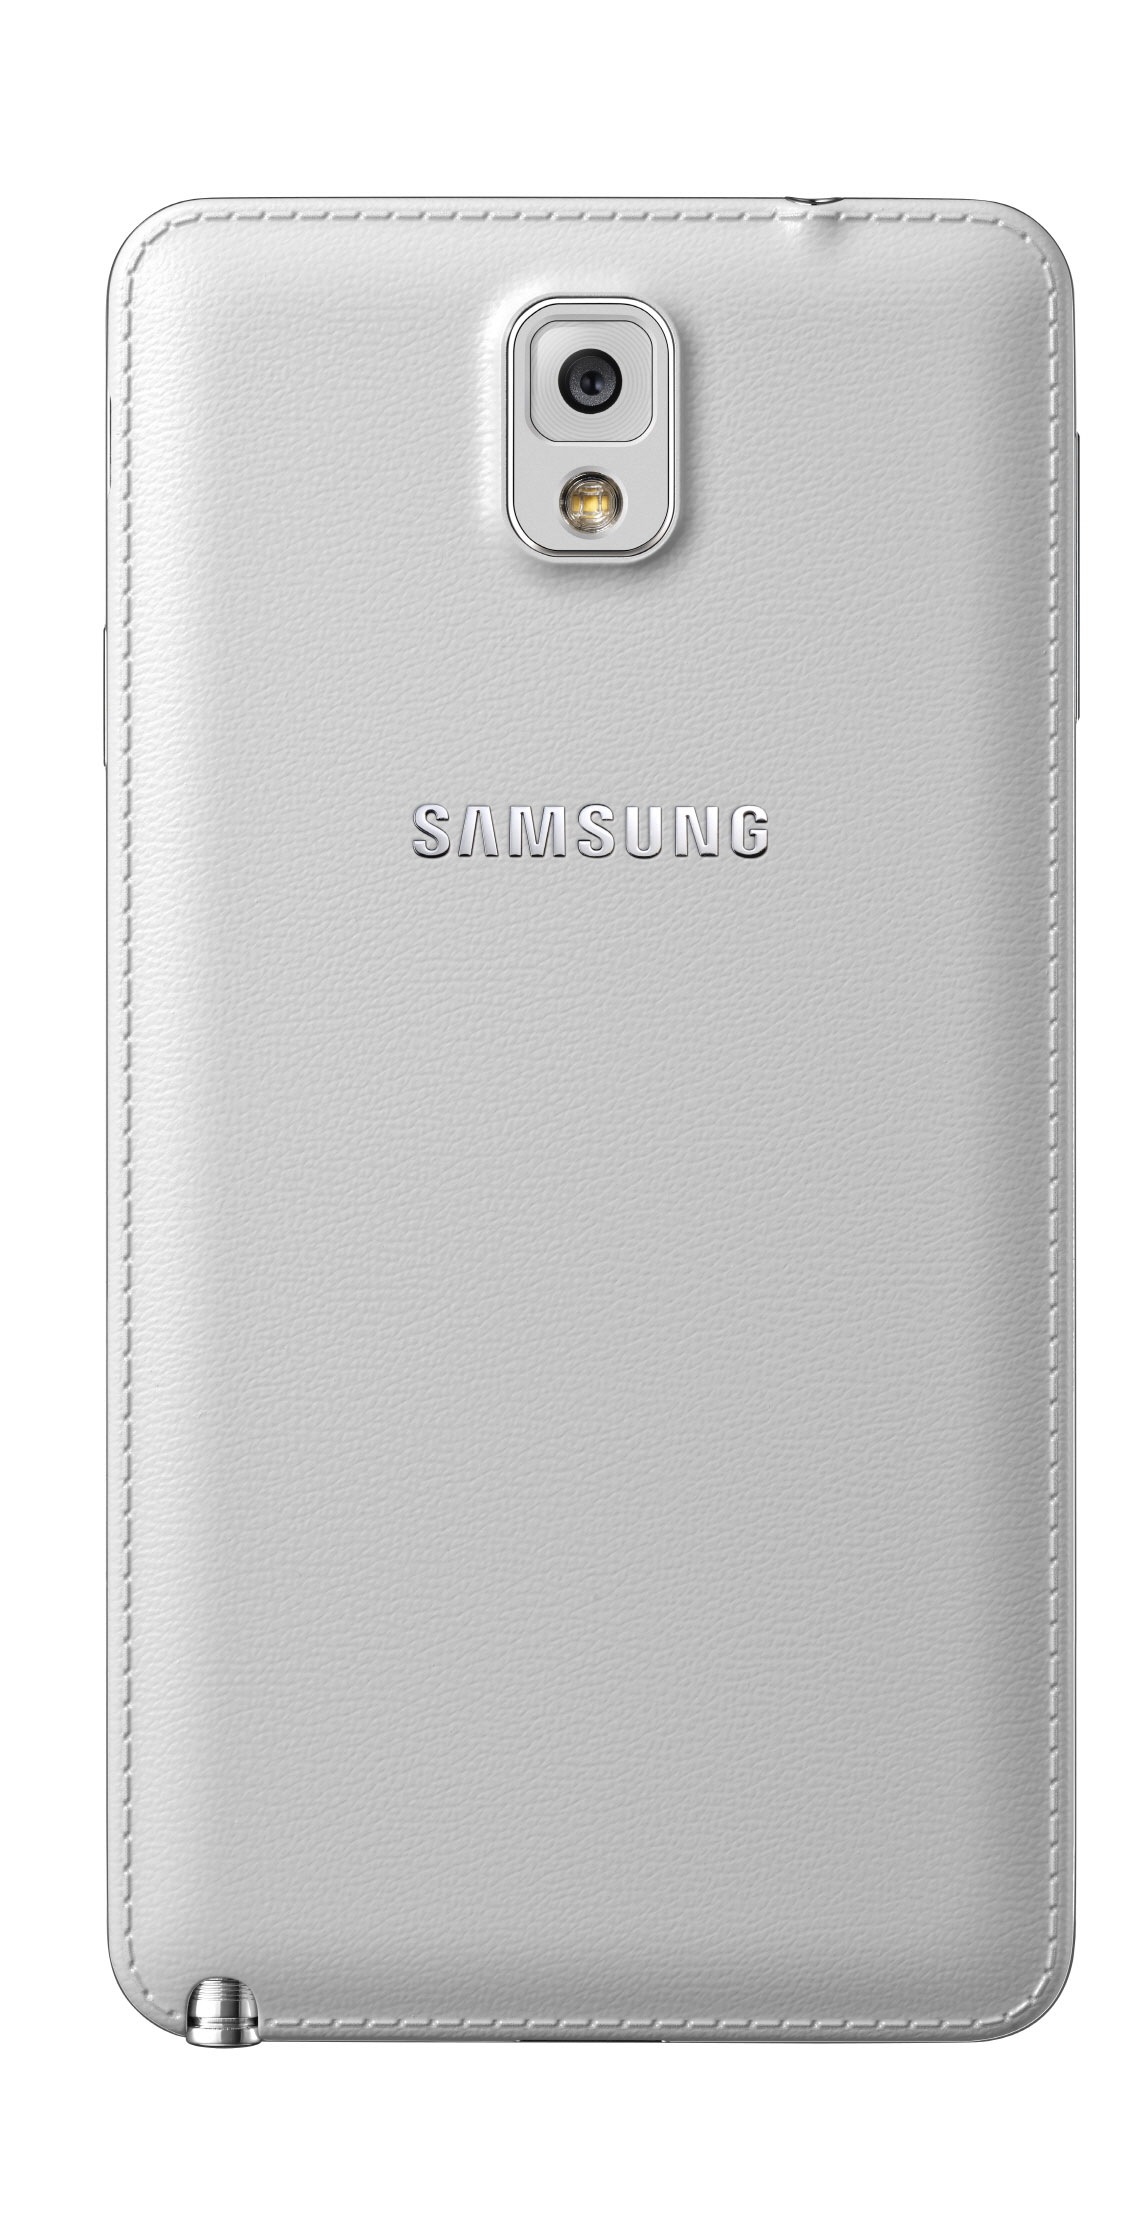 Galaxy-Note-3_3